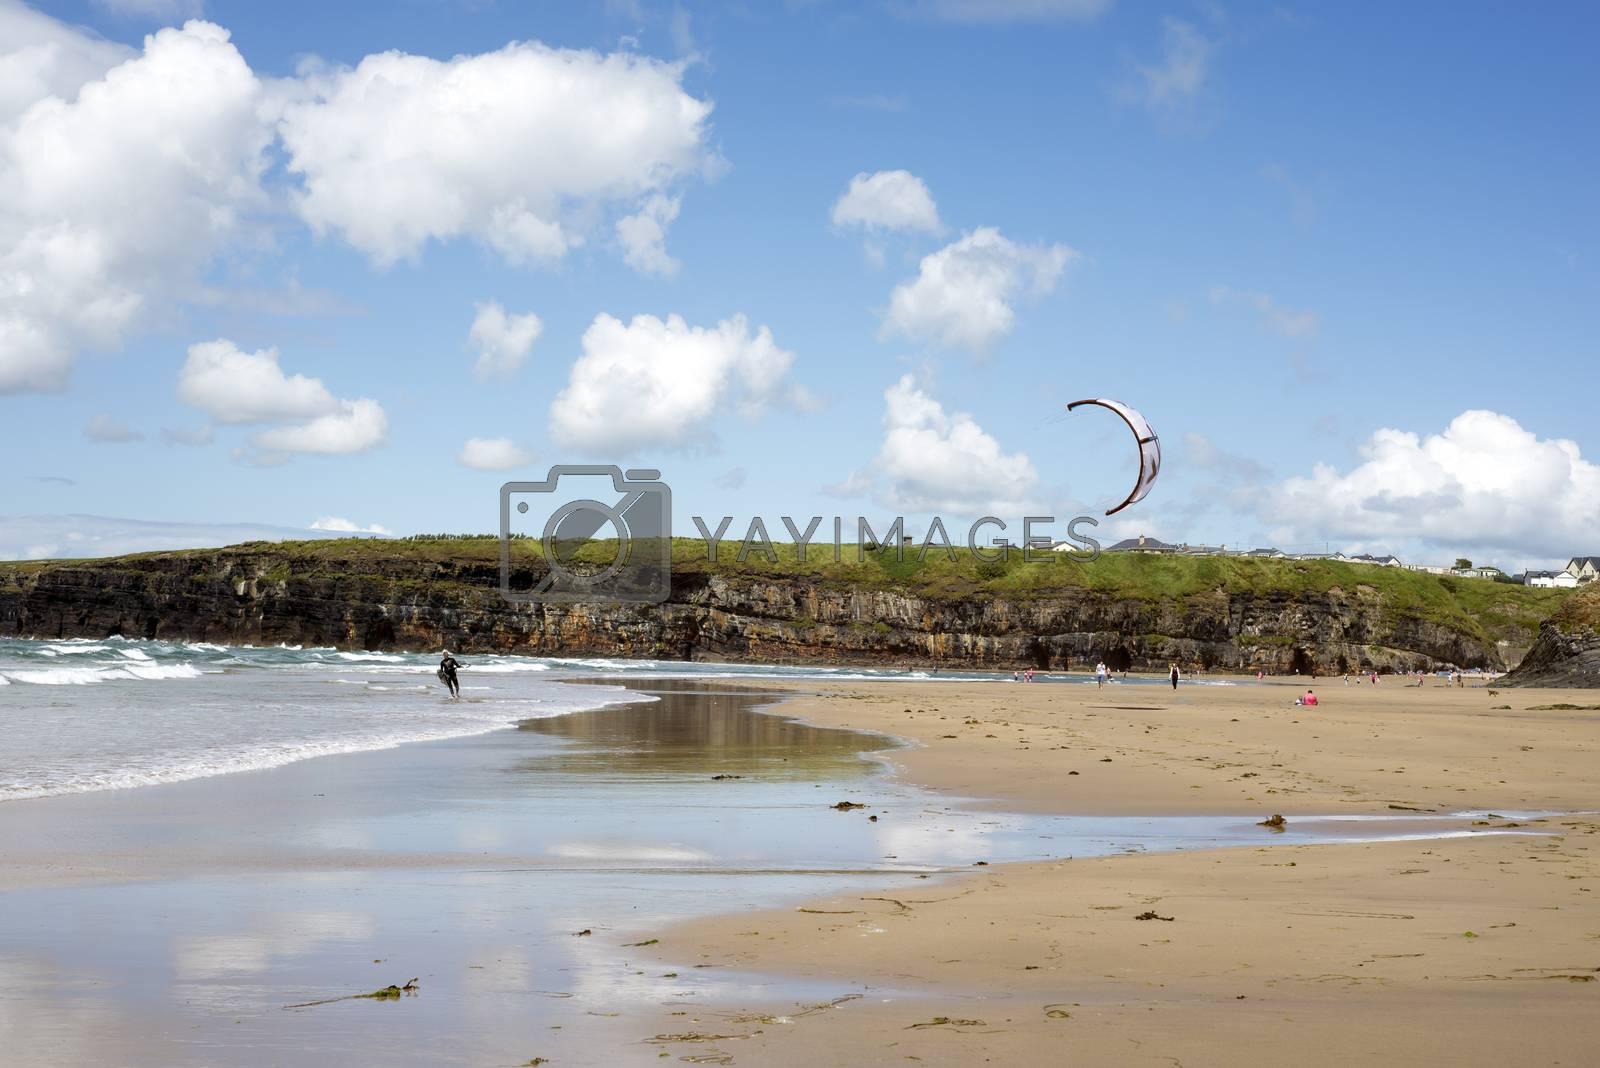 lone kite surfer getting ready at ballybunion beach on the wild atlantic way